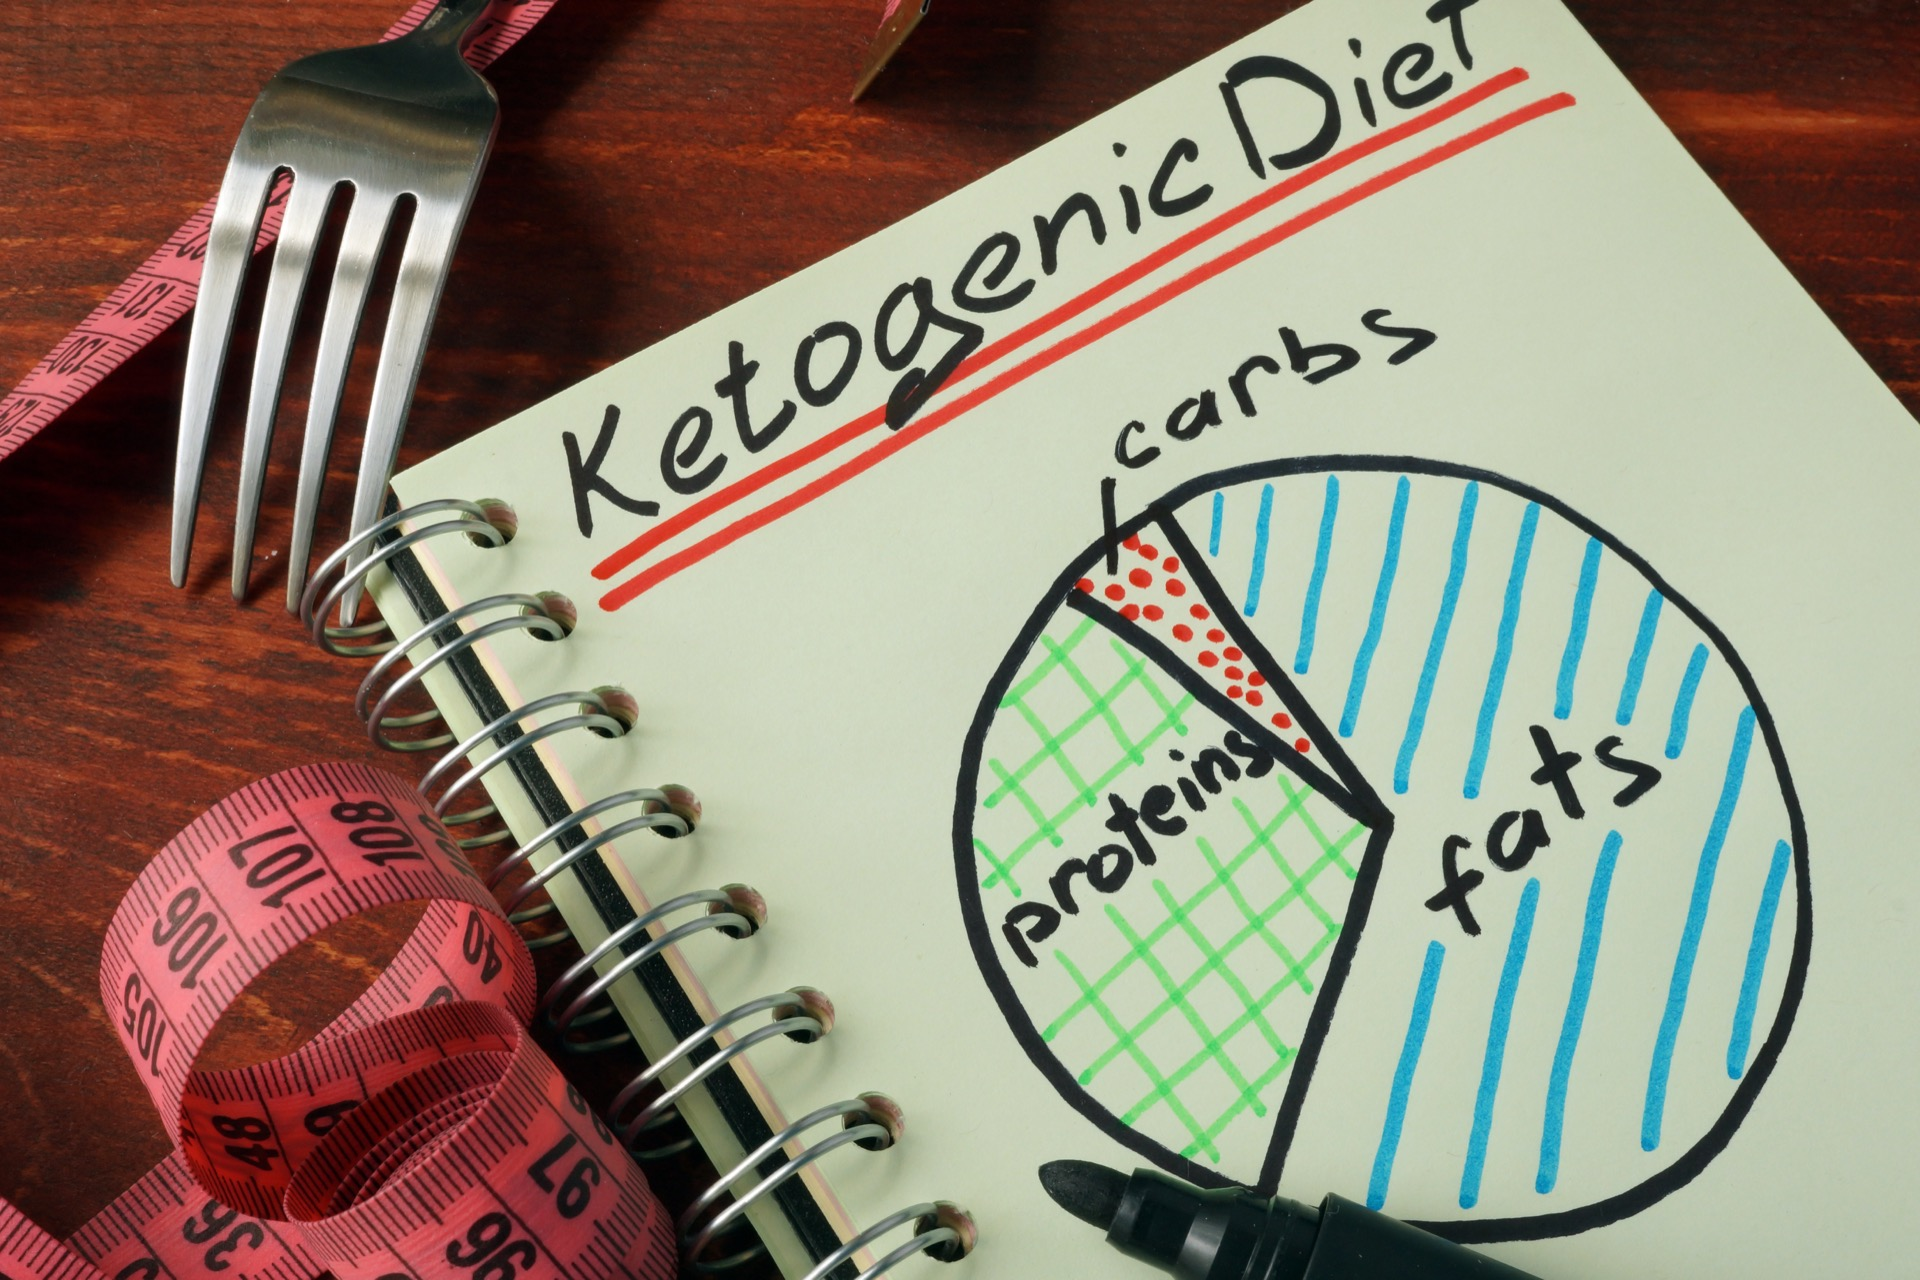 keto-diett komplett guide